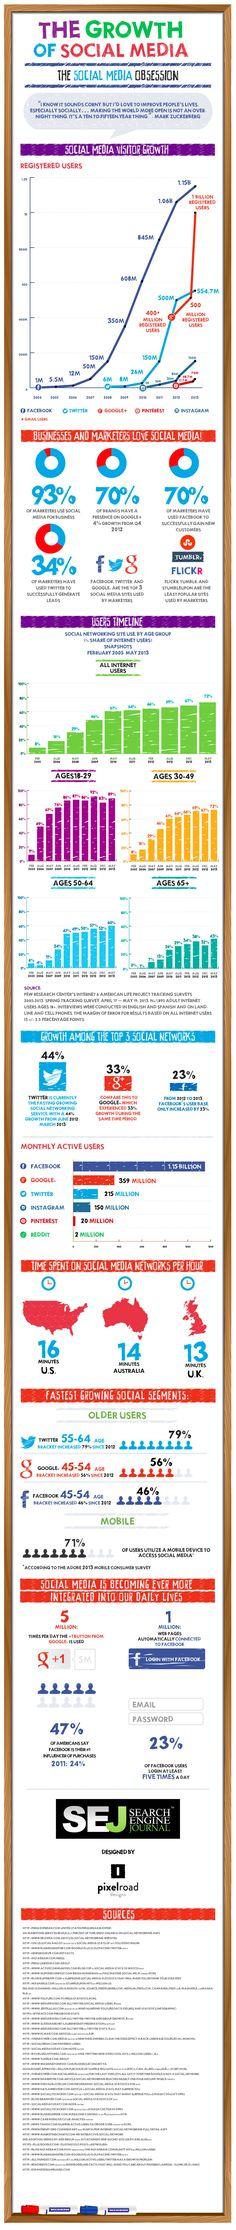 The growth of social media 2013 #infografia #infographic #socialmedia